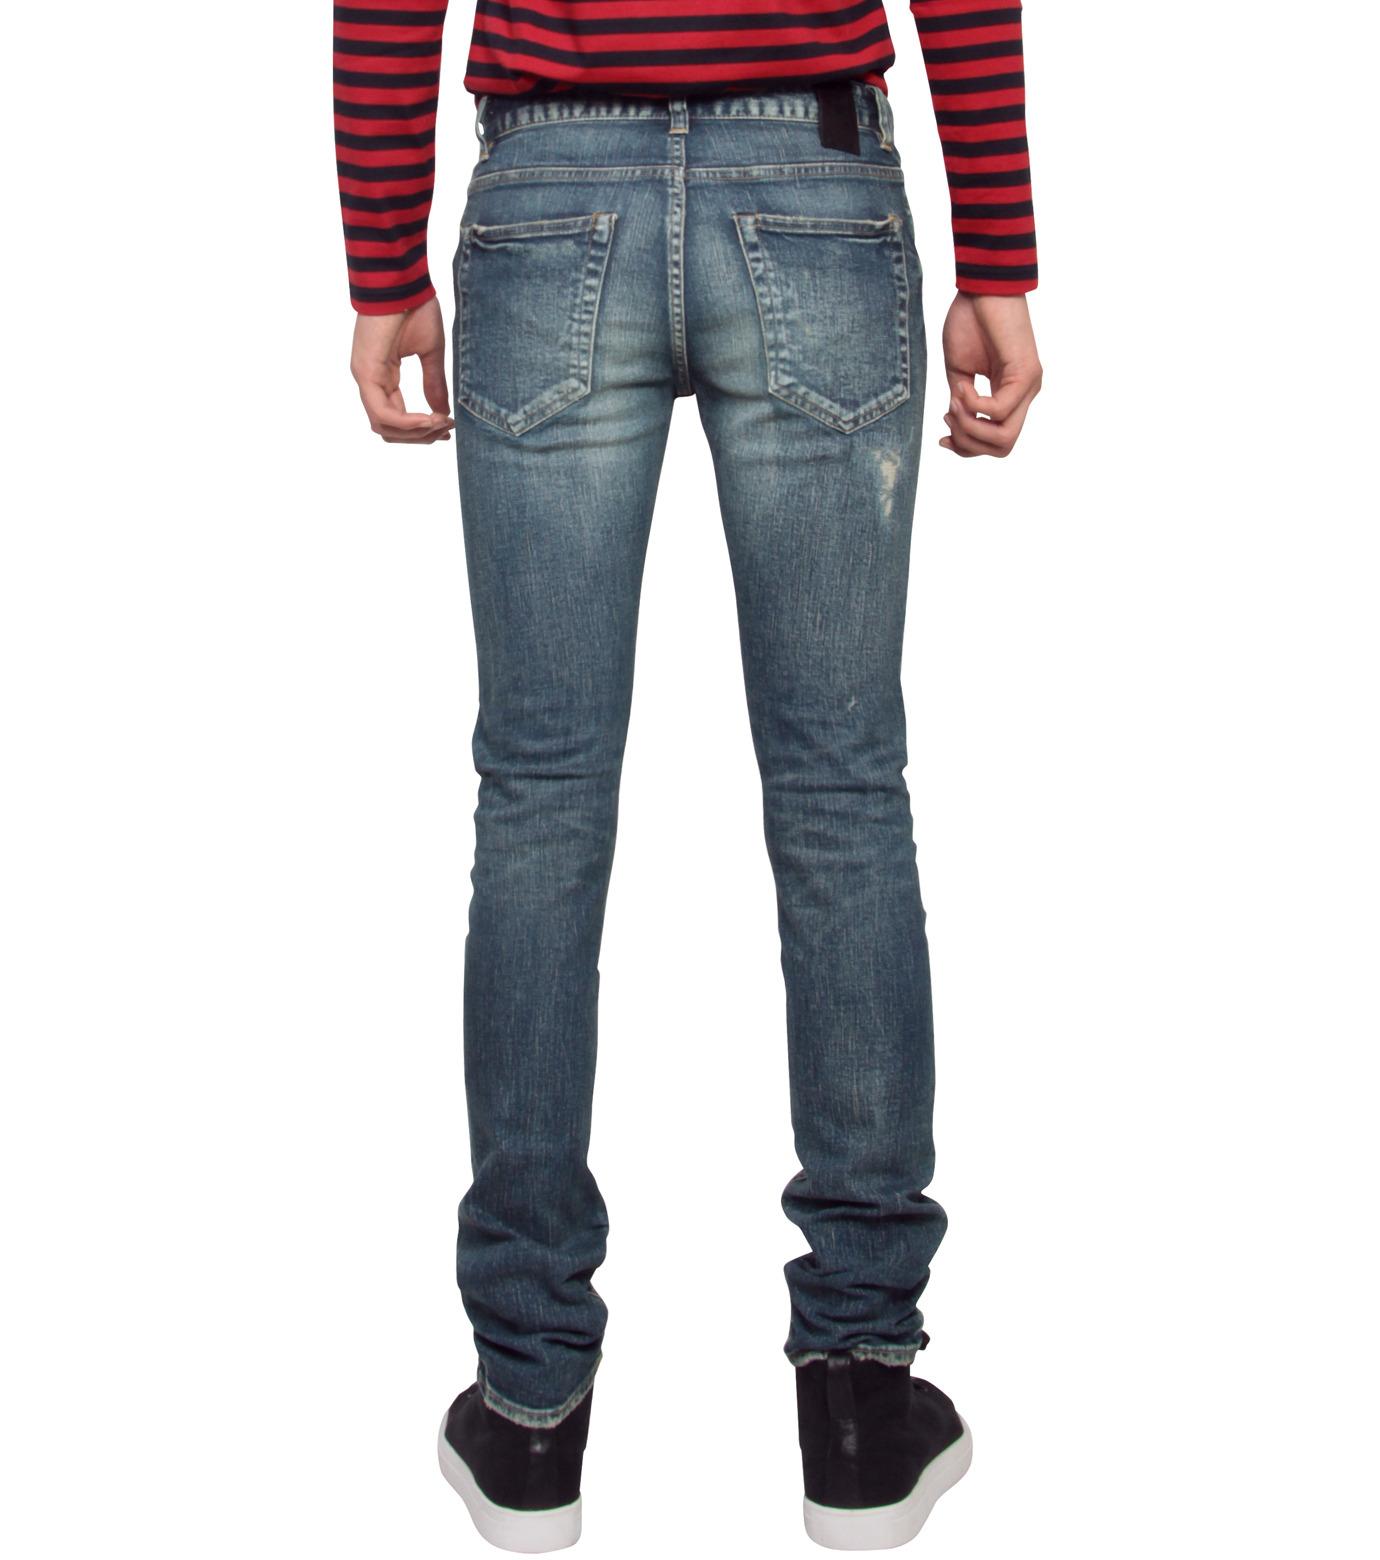 HL HEDDIE LOVU(エイチエル・エディールーヴ)のHL skinDamage-BLUE(パンツ/pants)-HL-skinDamag-92 拡大詳細画像2